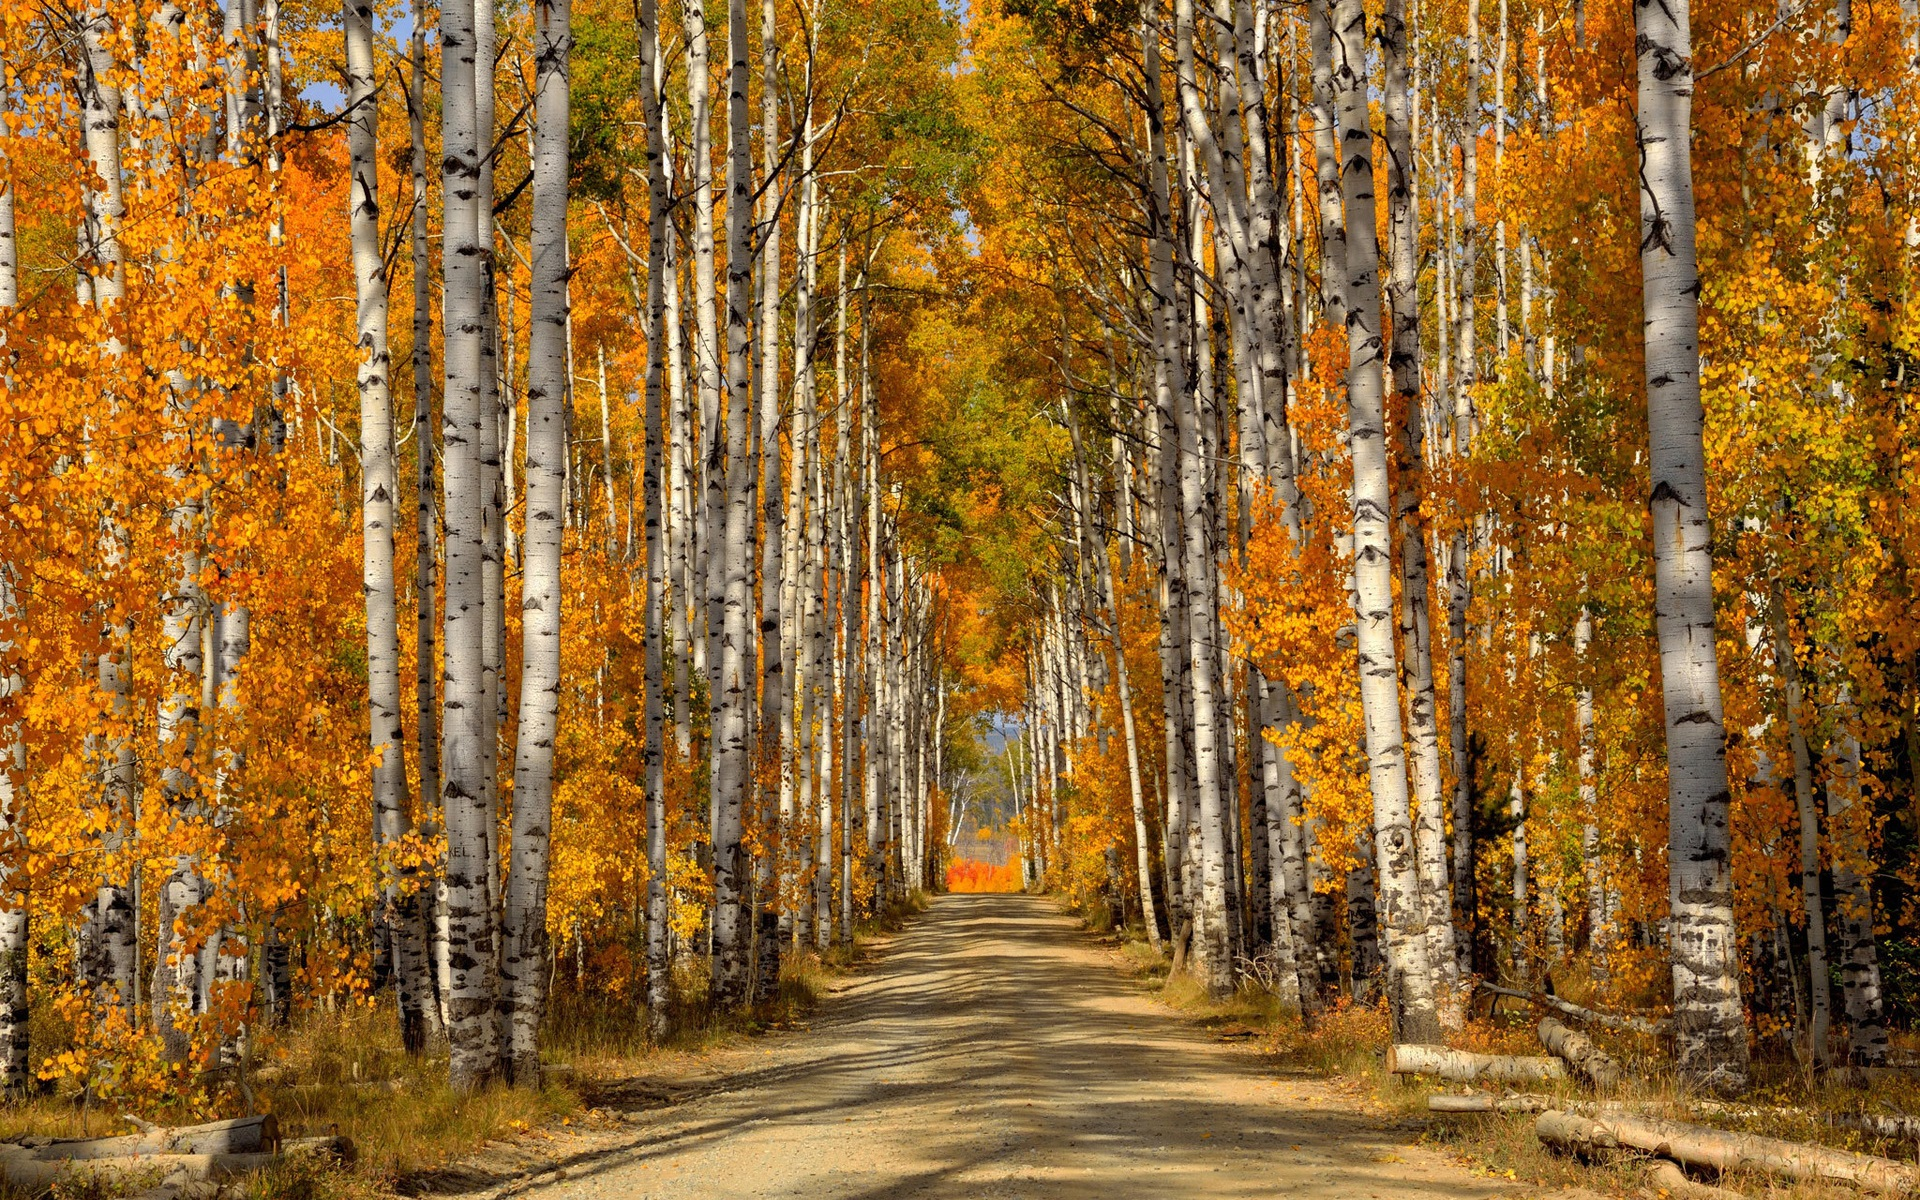 Fall Walk Wallpaper Forest Trees Birch Leaves Autumn Road Wallpaper